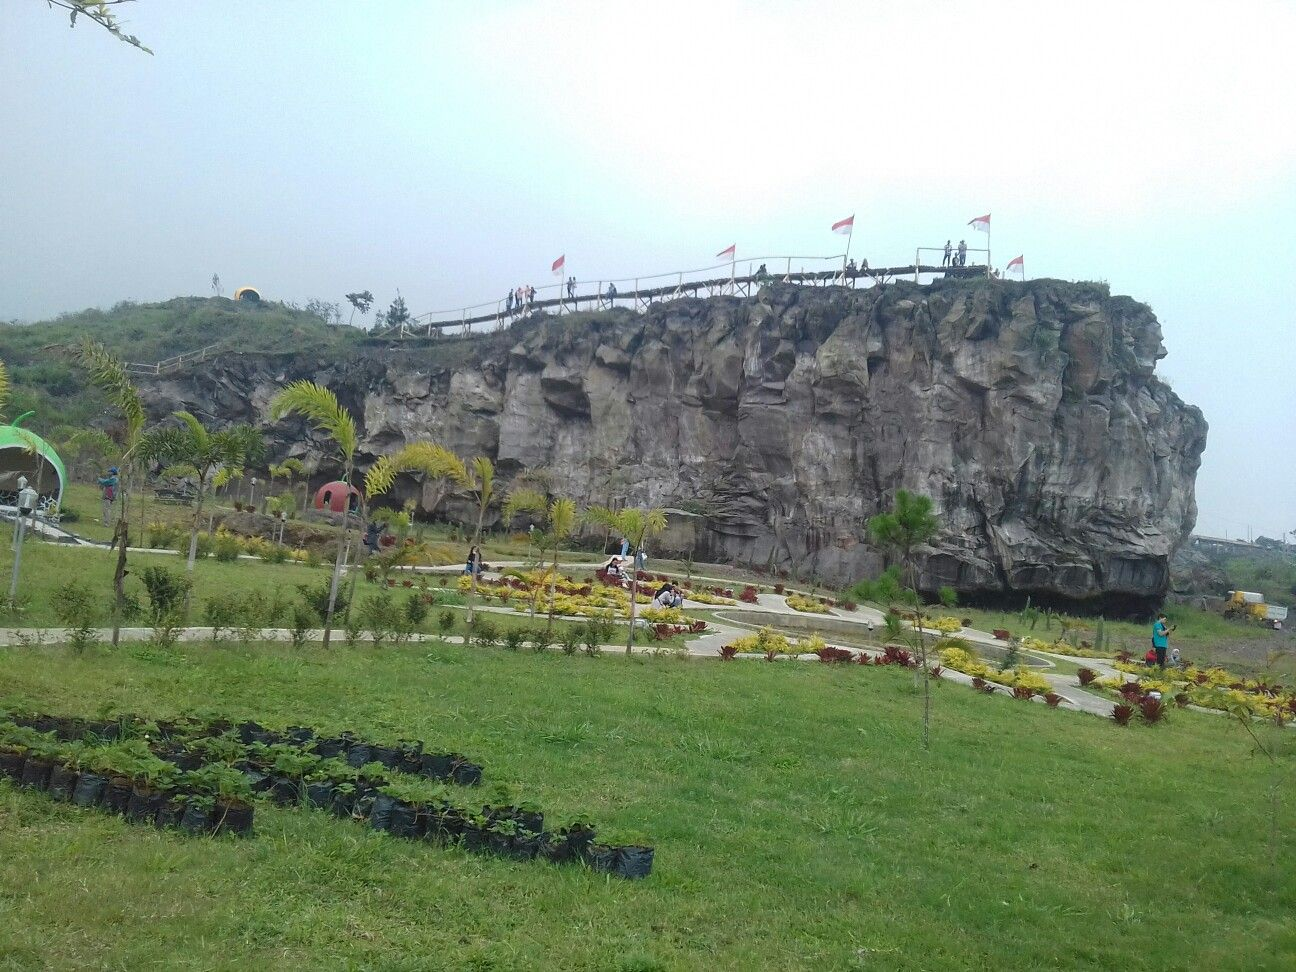 Taman Cisantana Cigugur Kuningan Jawa Barat Fotografi Perjalanan Perjalanan Fotografi